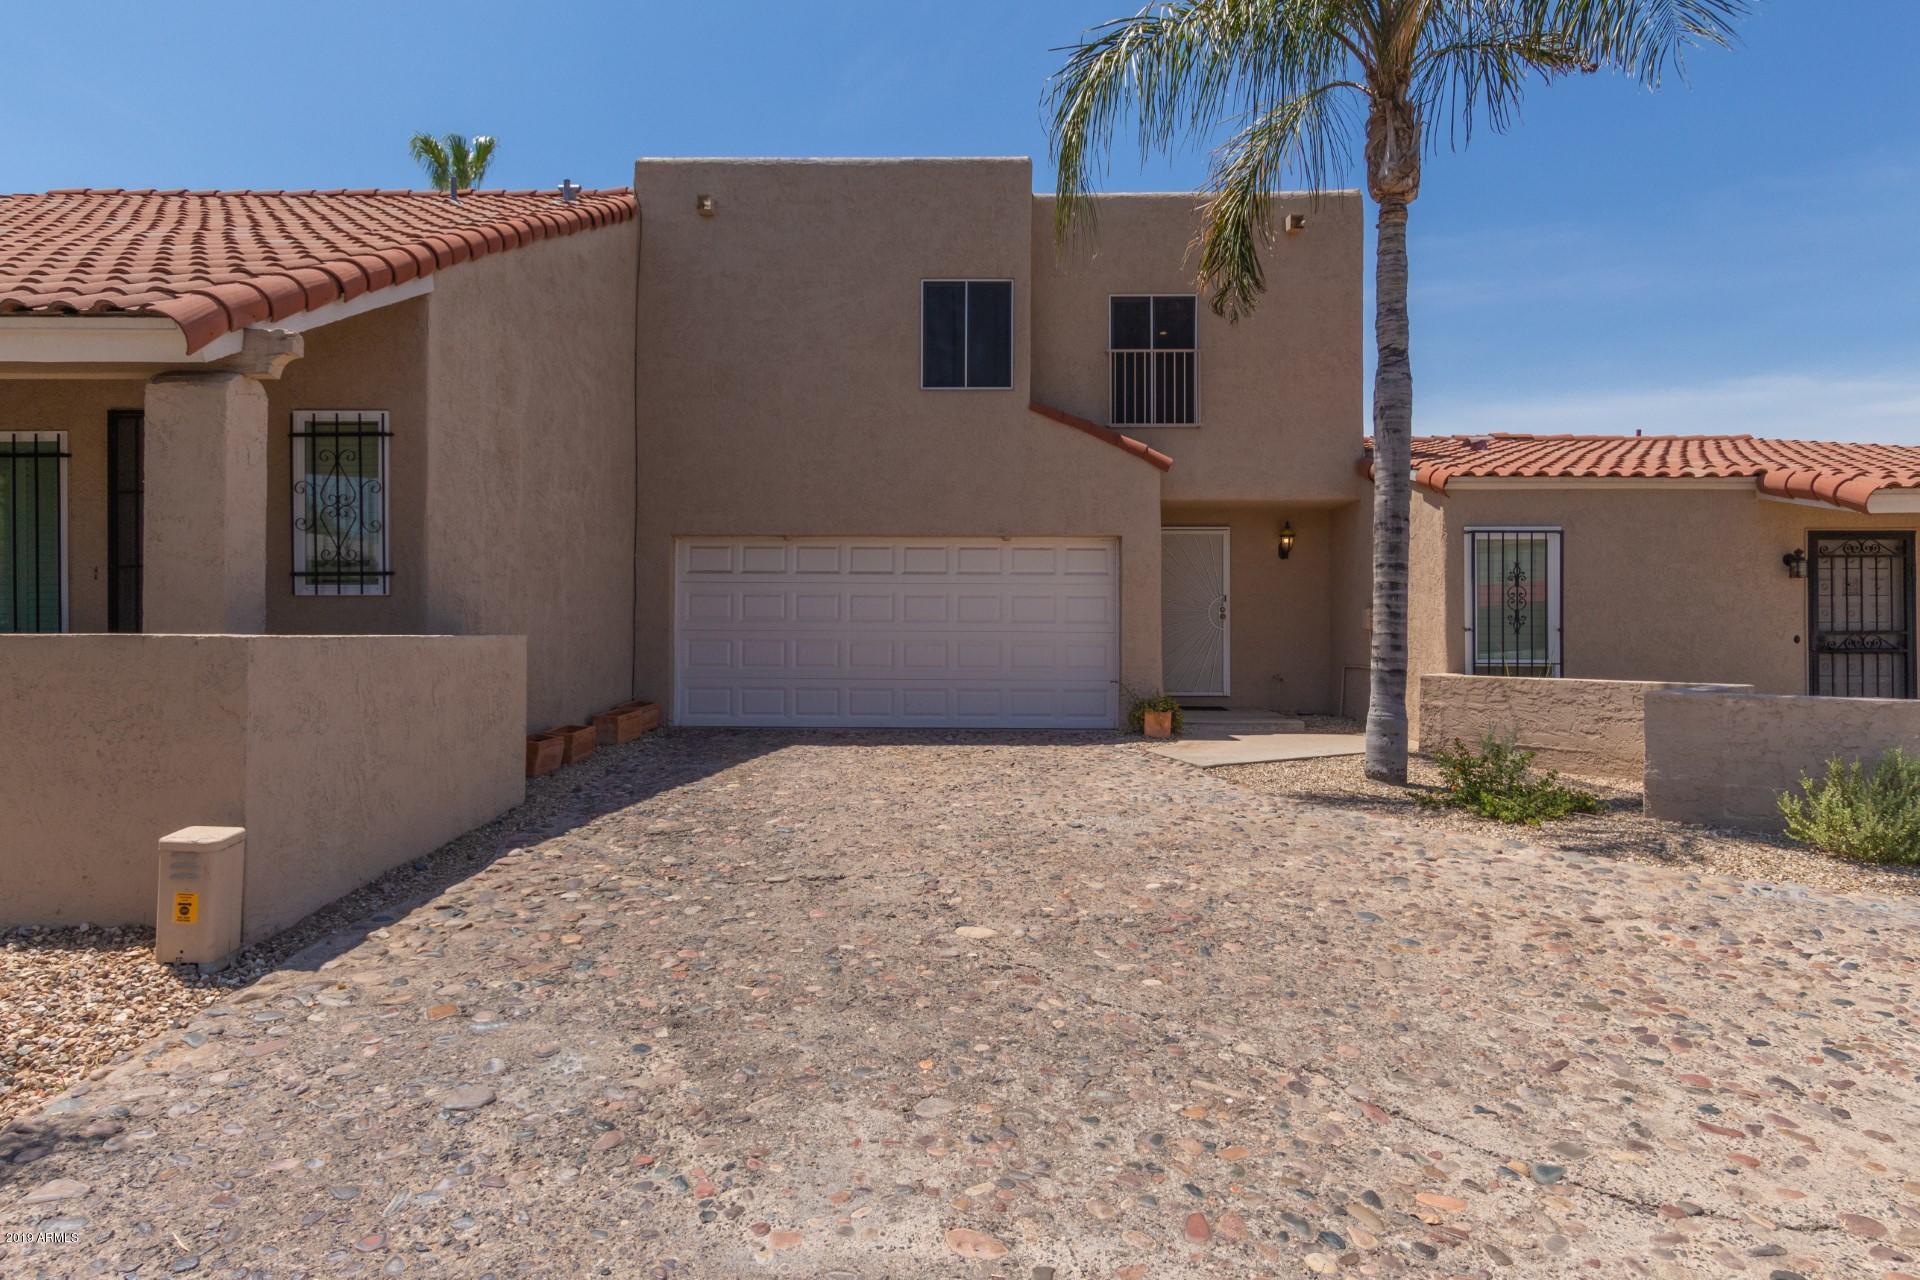 Photo of 5837 N 8TH Place, Phoenix, AZ 85014